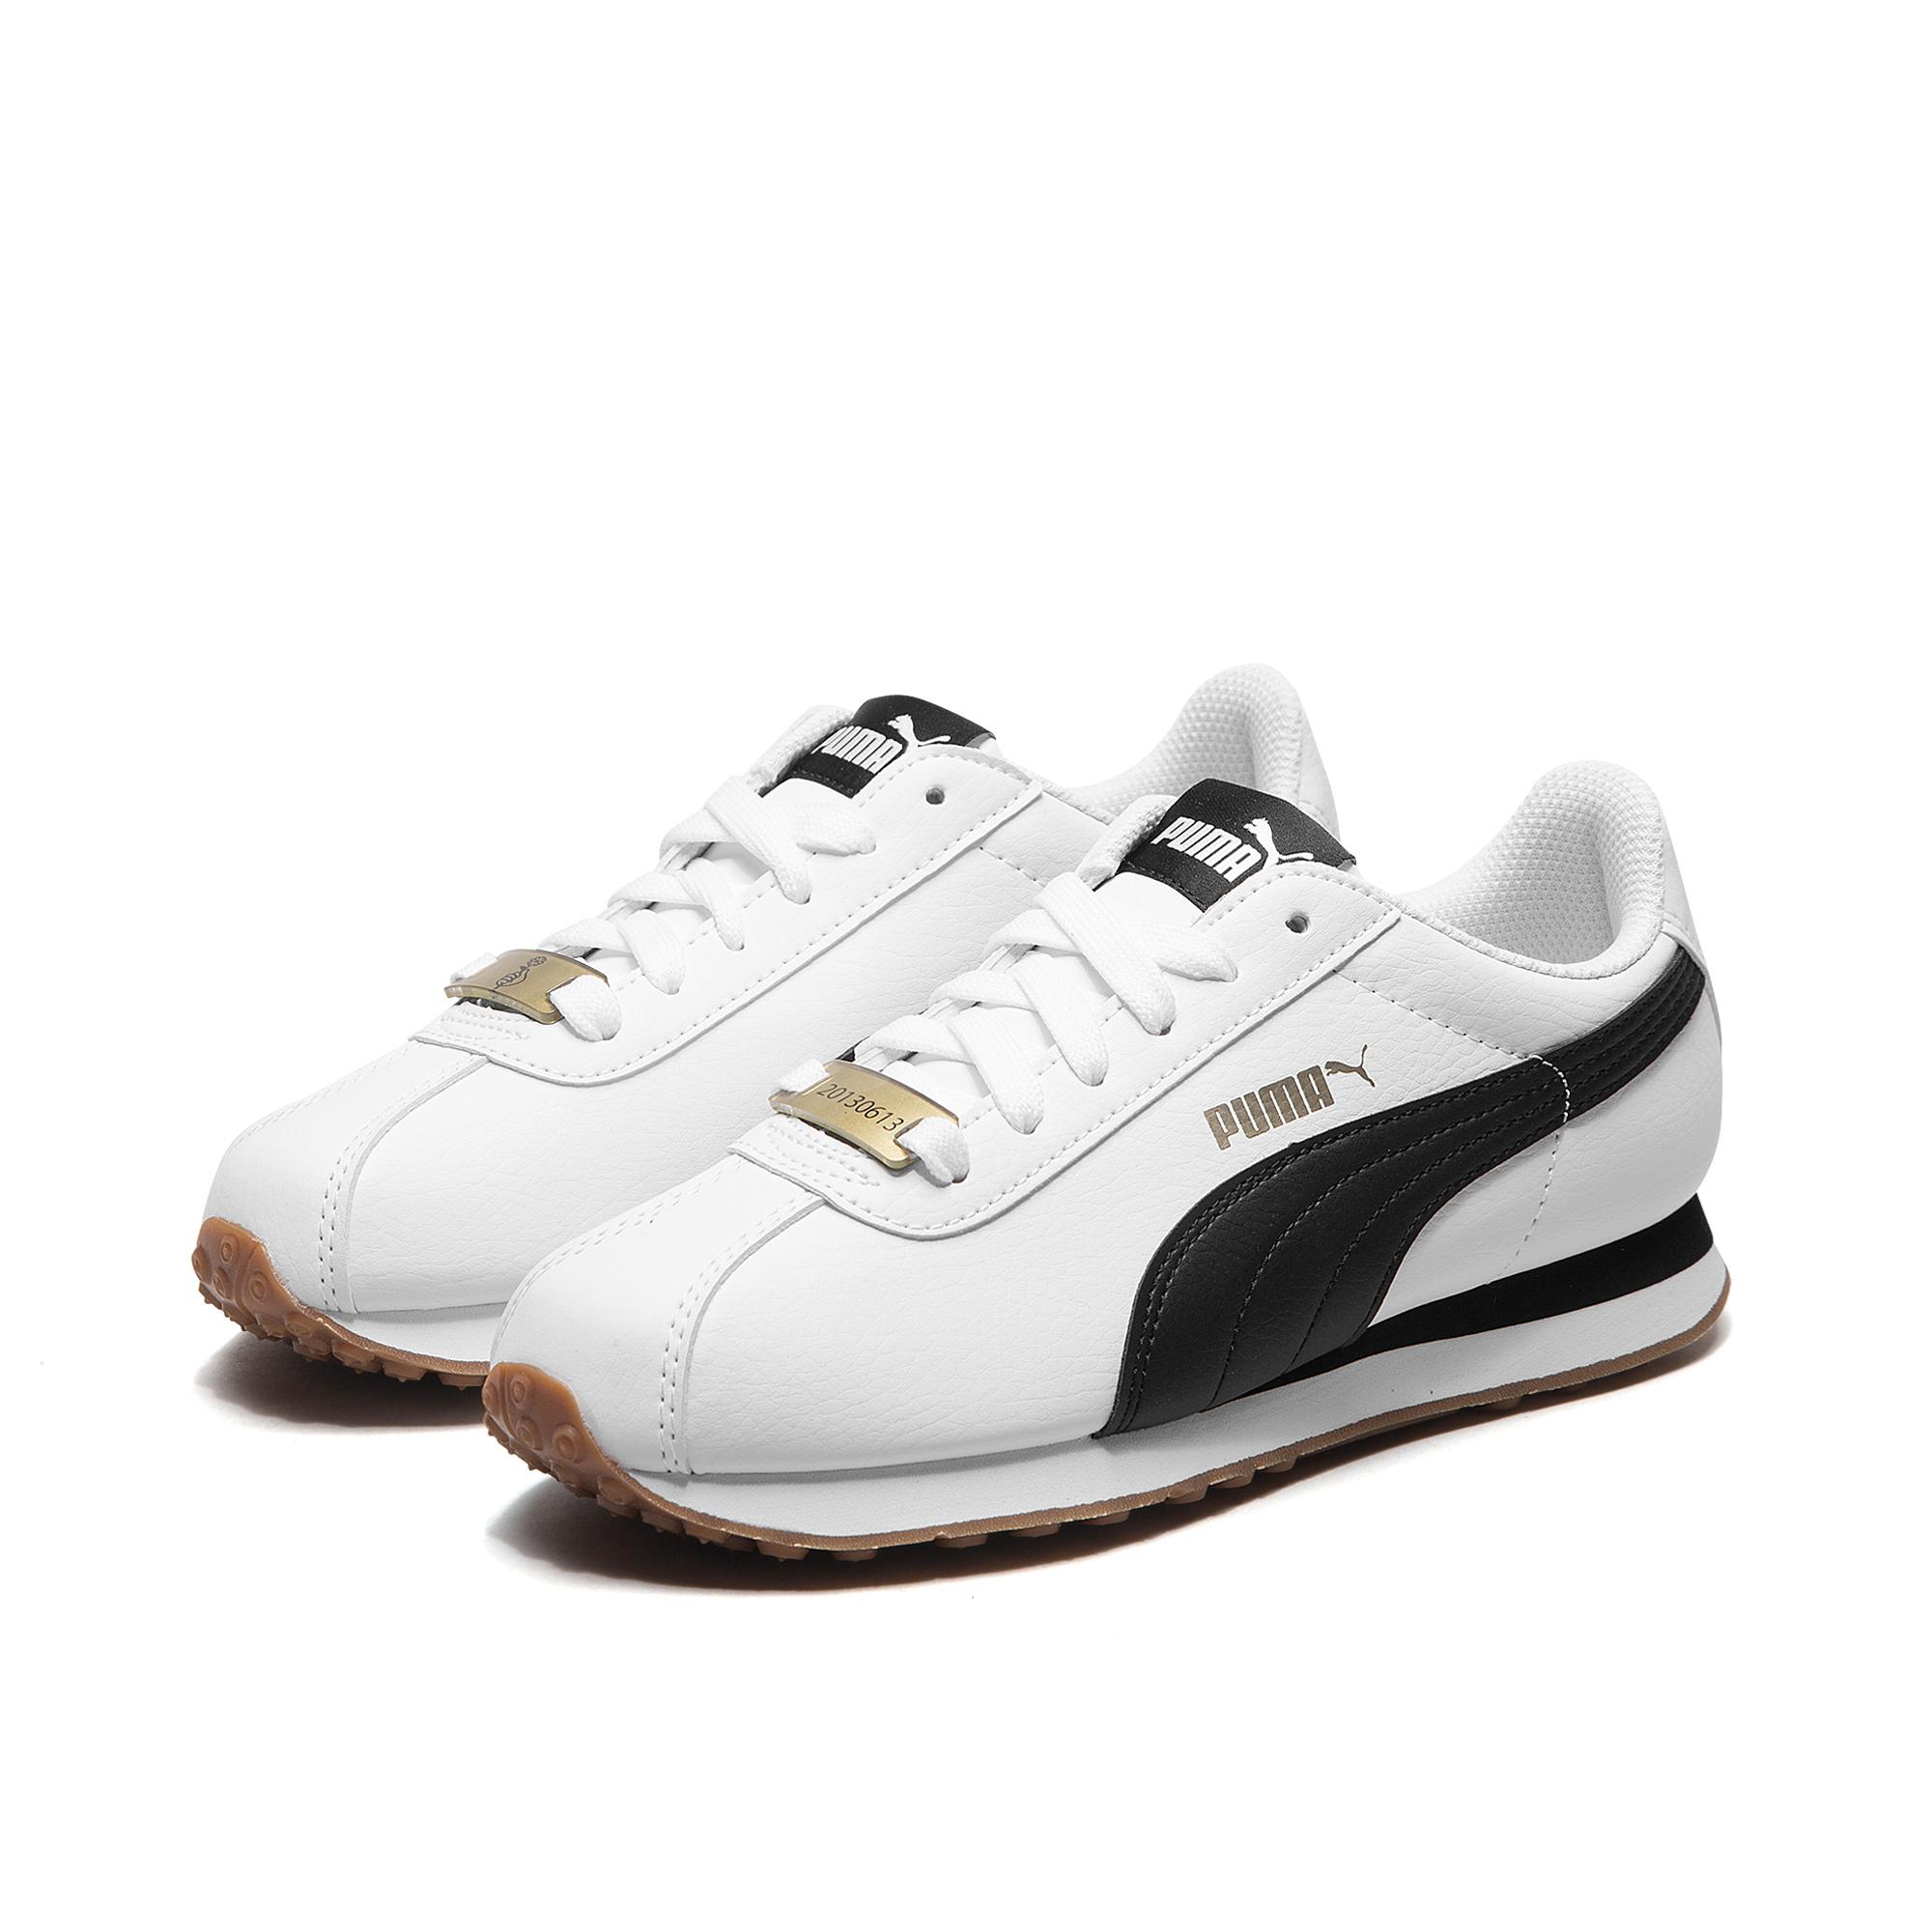 4b0ecbe3586 Puma Puma official unisex casual shoes PUMA X BTS Turin 368188